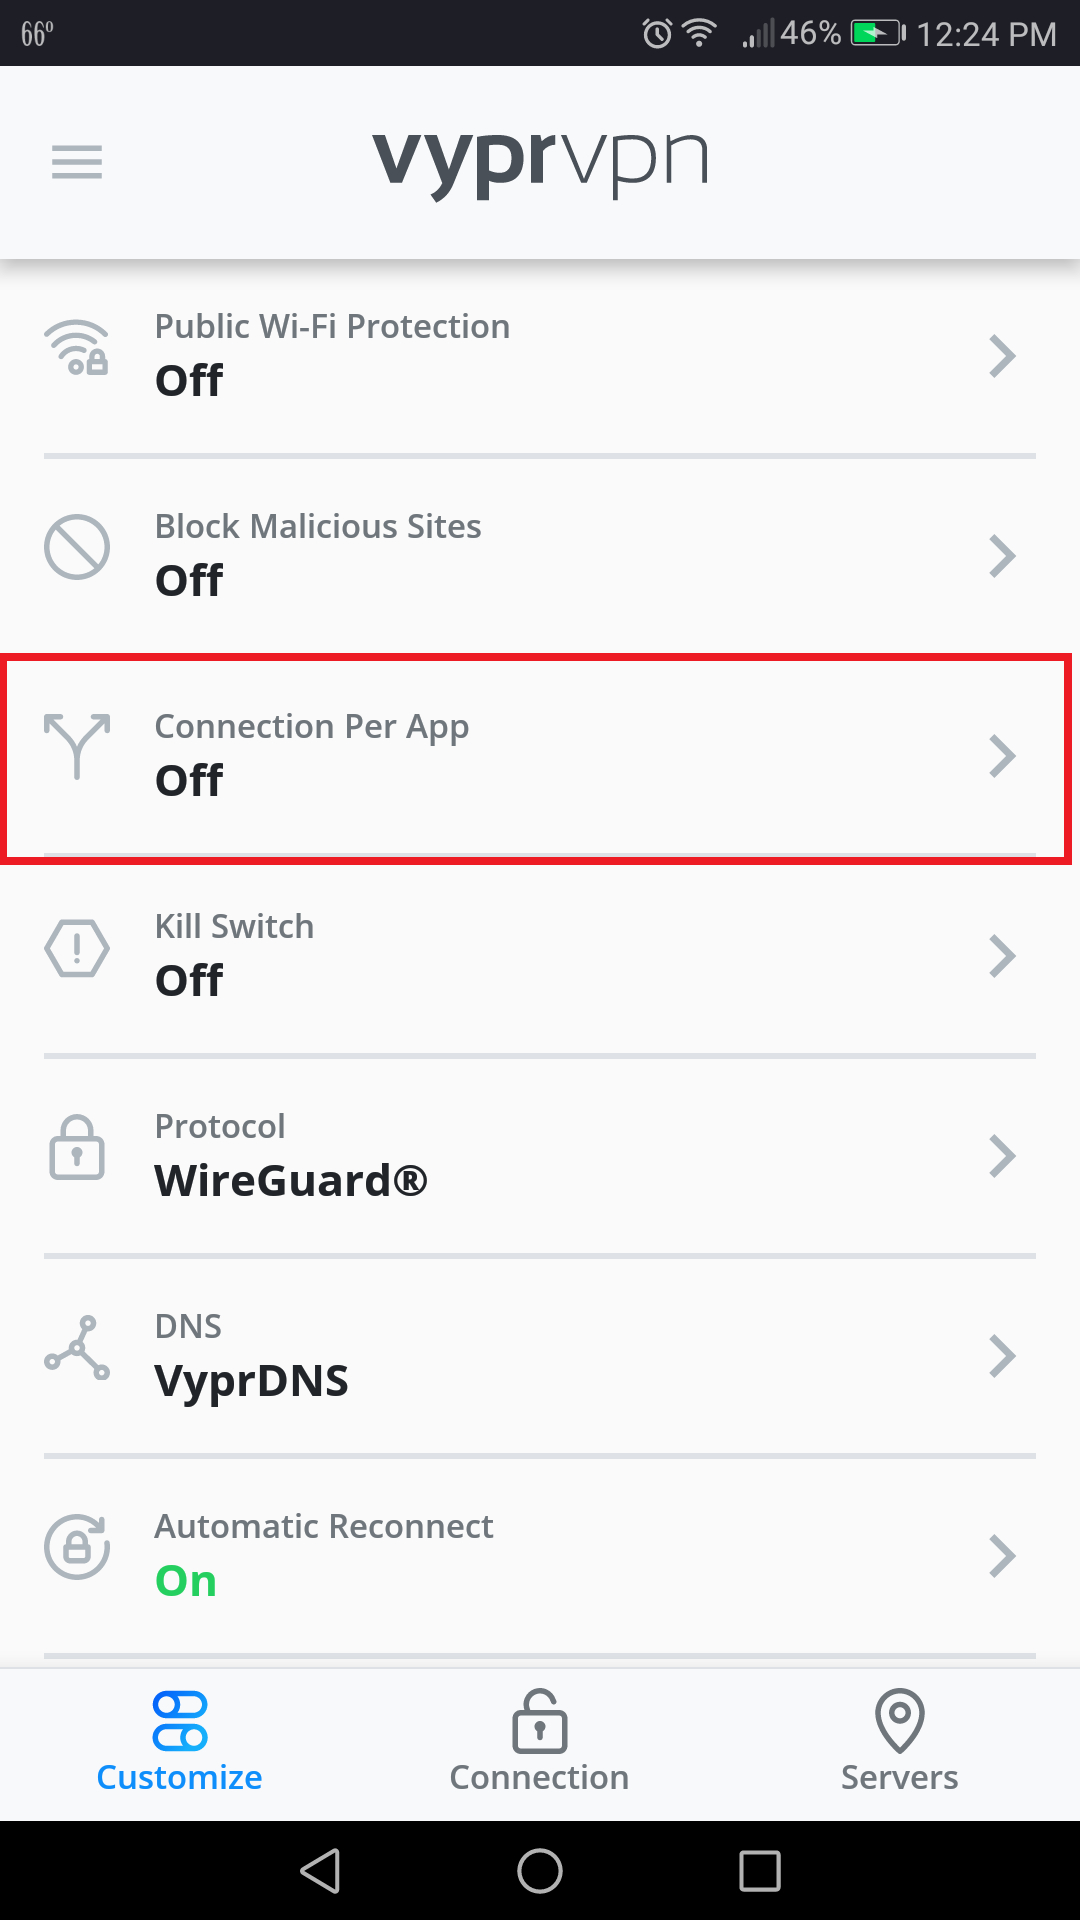 Vypr_App _-_ Customize_Menu _-_ Connection_Per_App_Selected.png